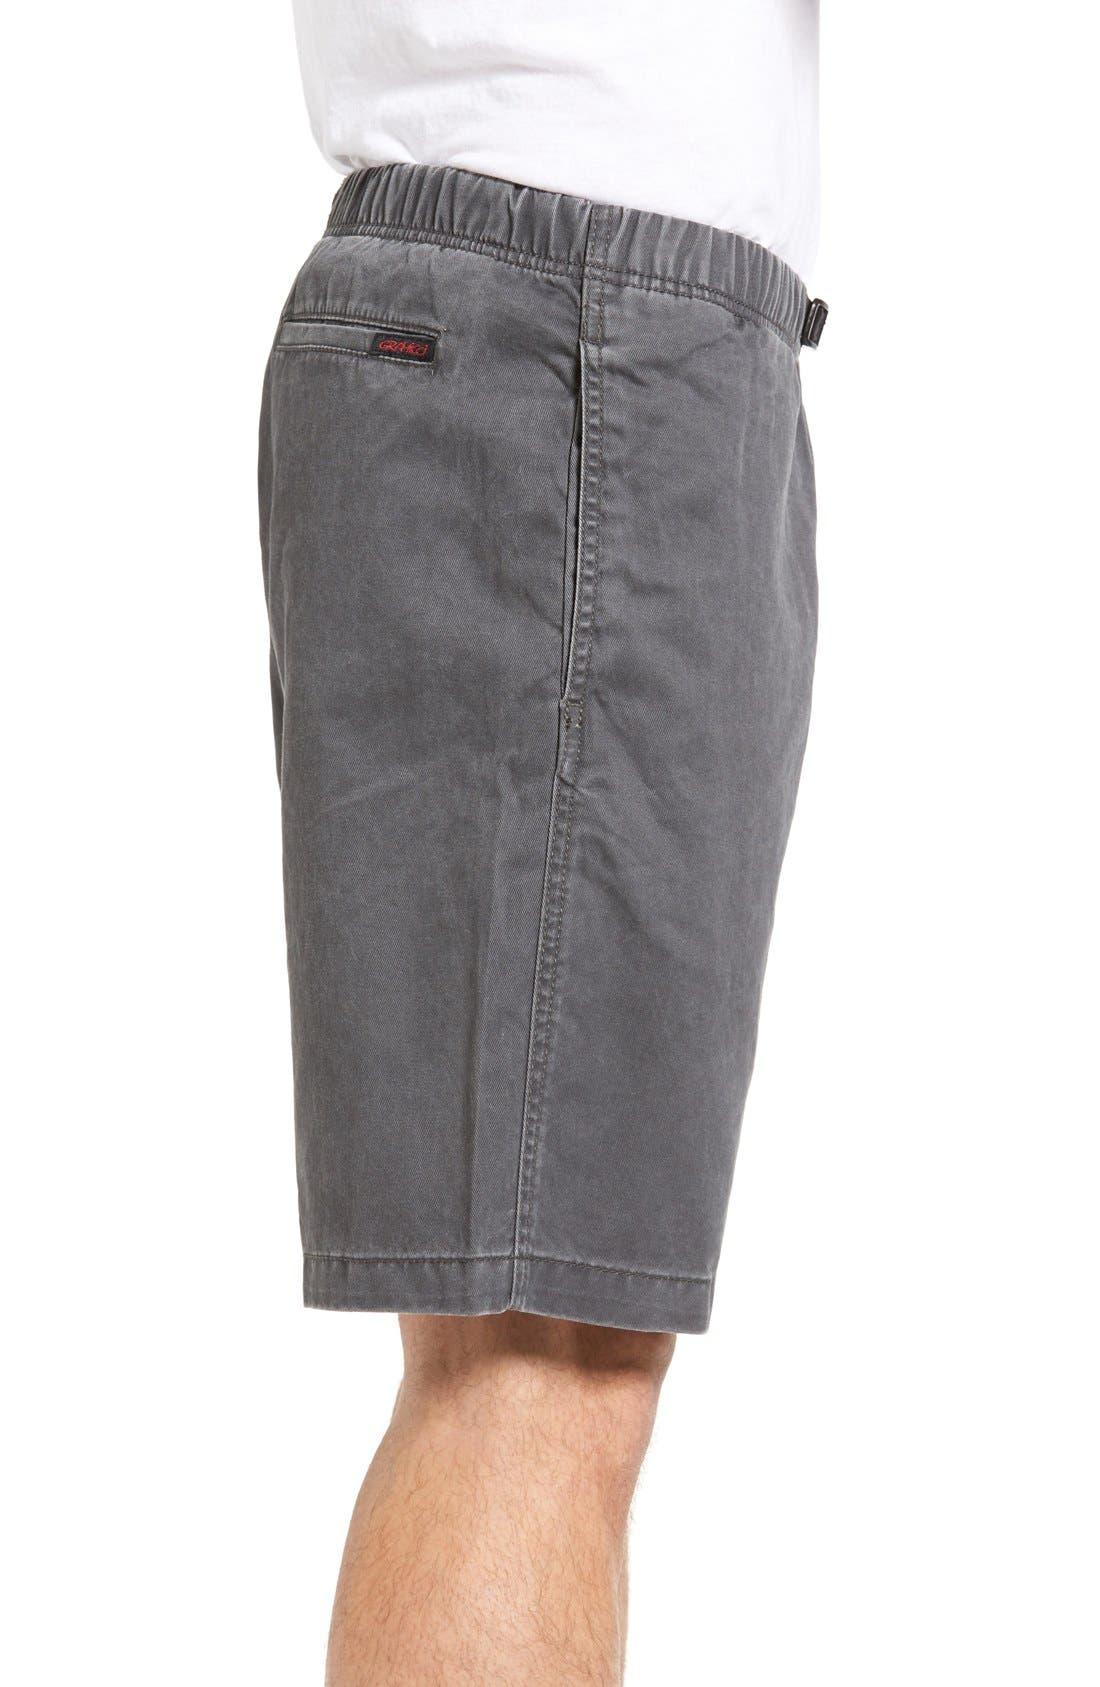 Rockin Sport Shorts,                             Alternate thumbnail 3, color,                             Asphalt Grey